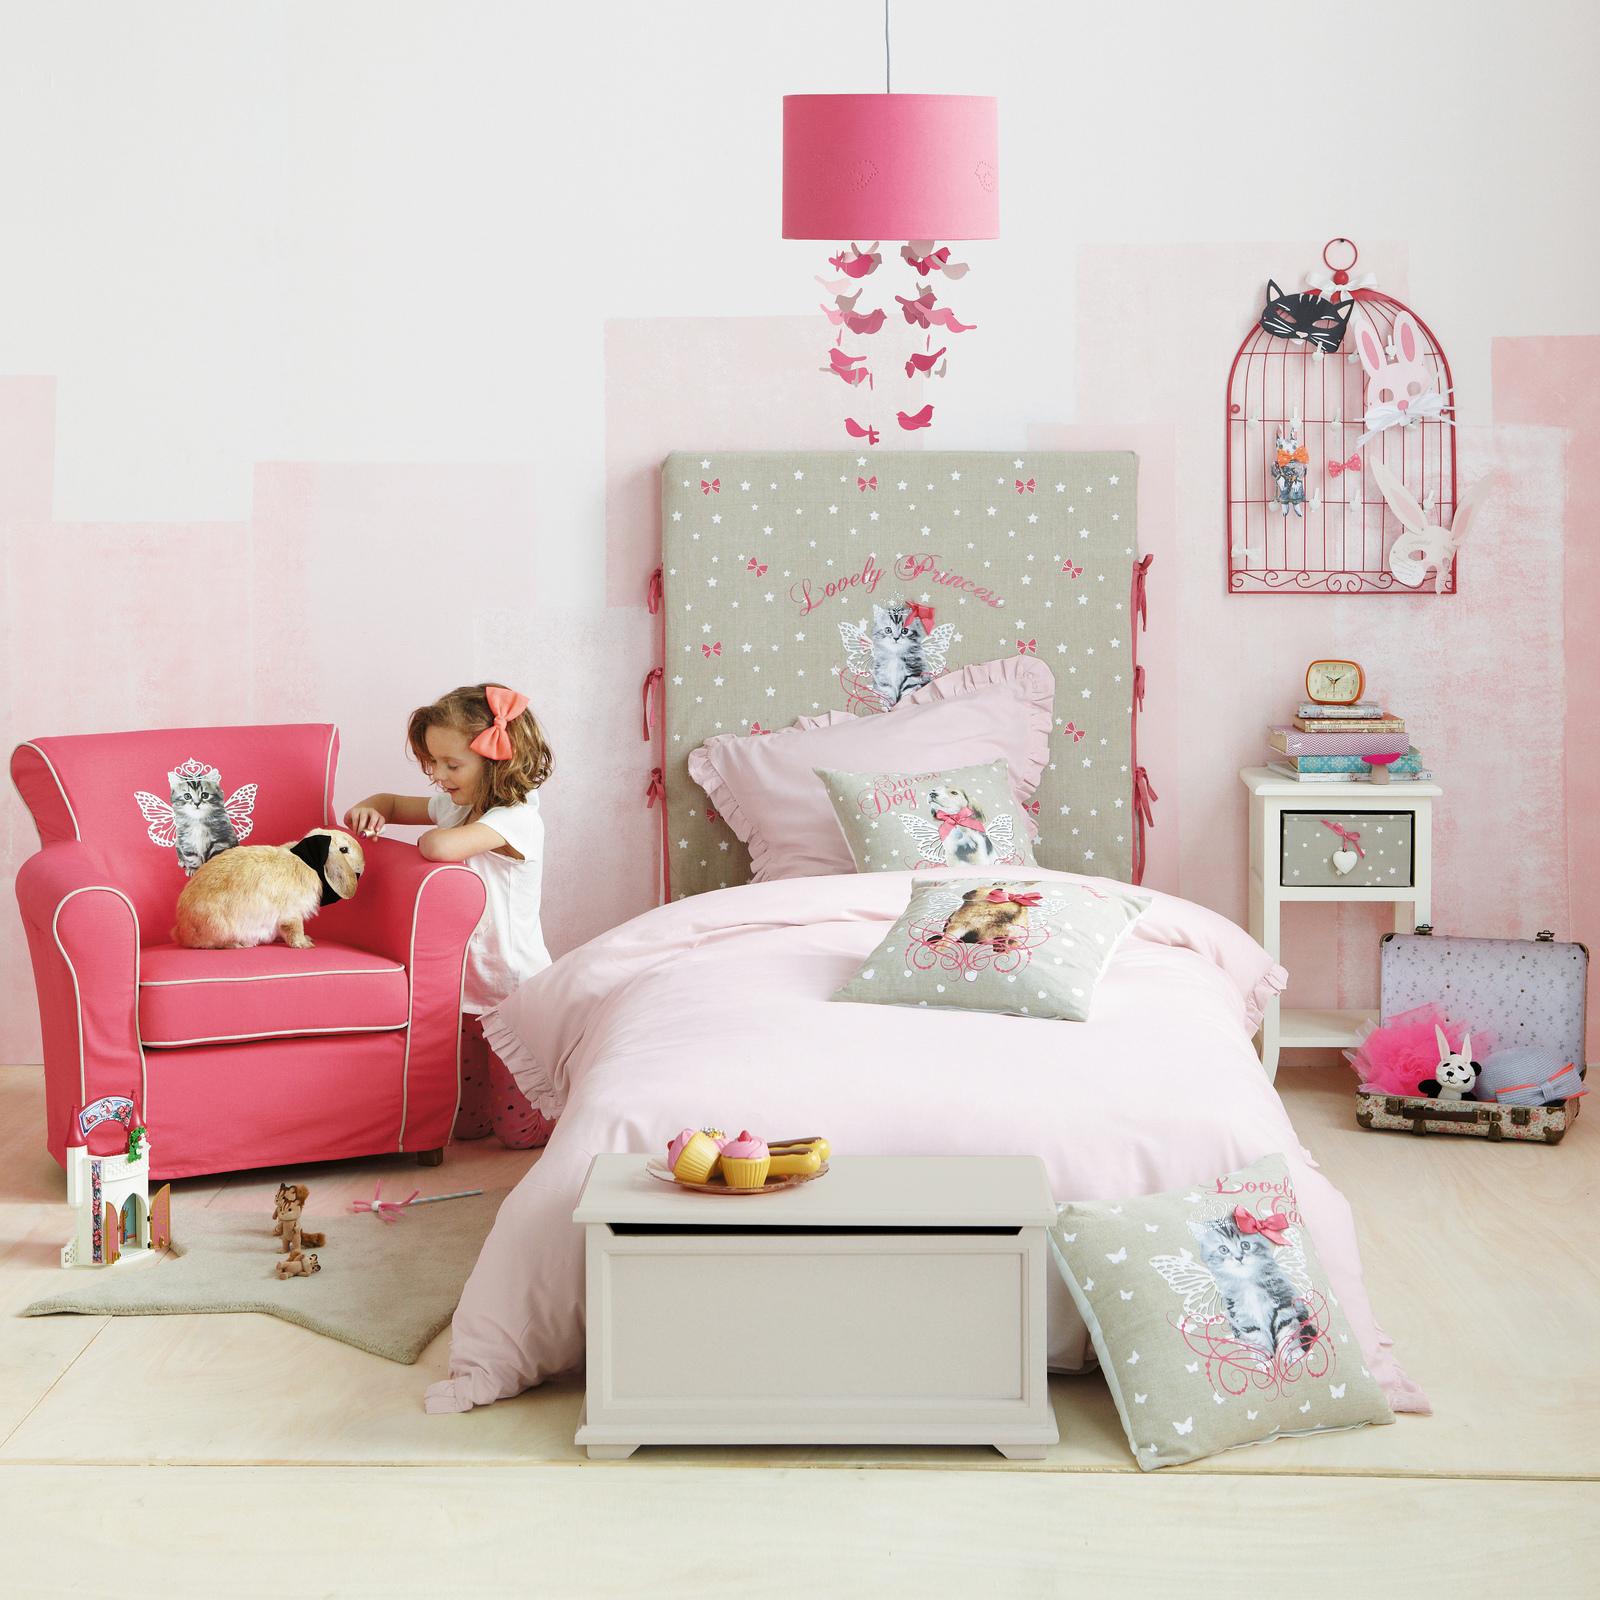 creative ordinette maisons du monde junior collection. Black Bedroom Furniture Sets. Home Design Ideas